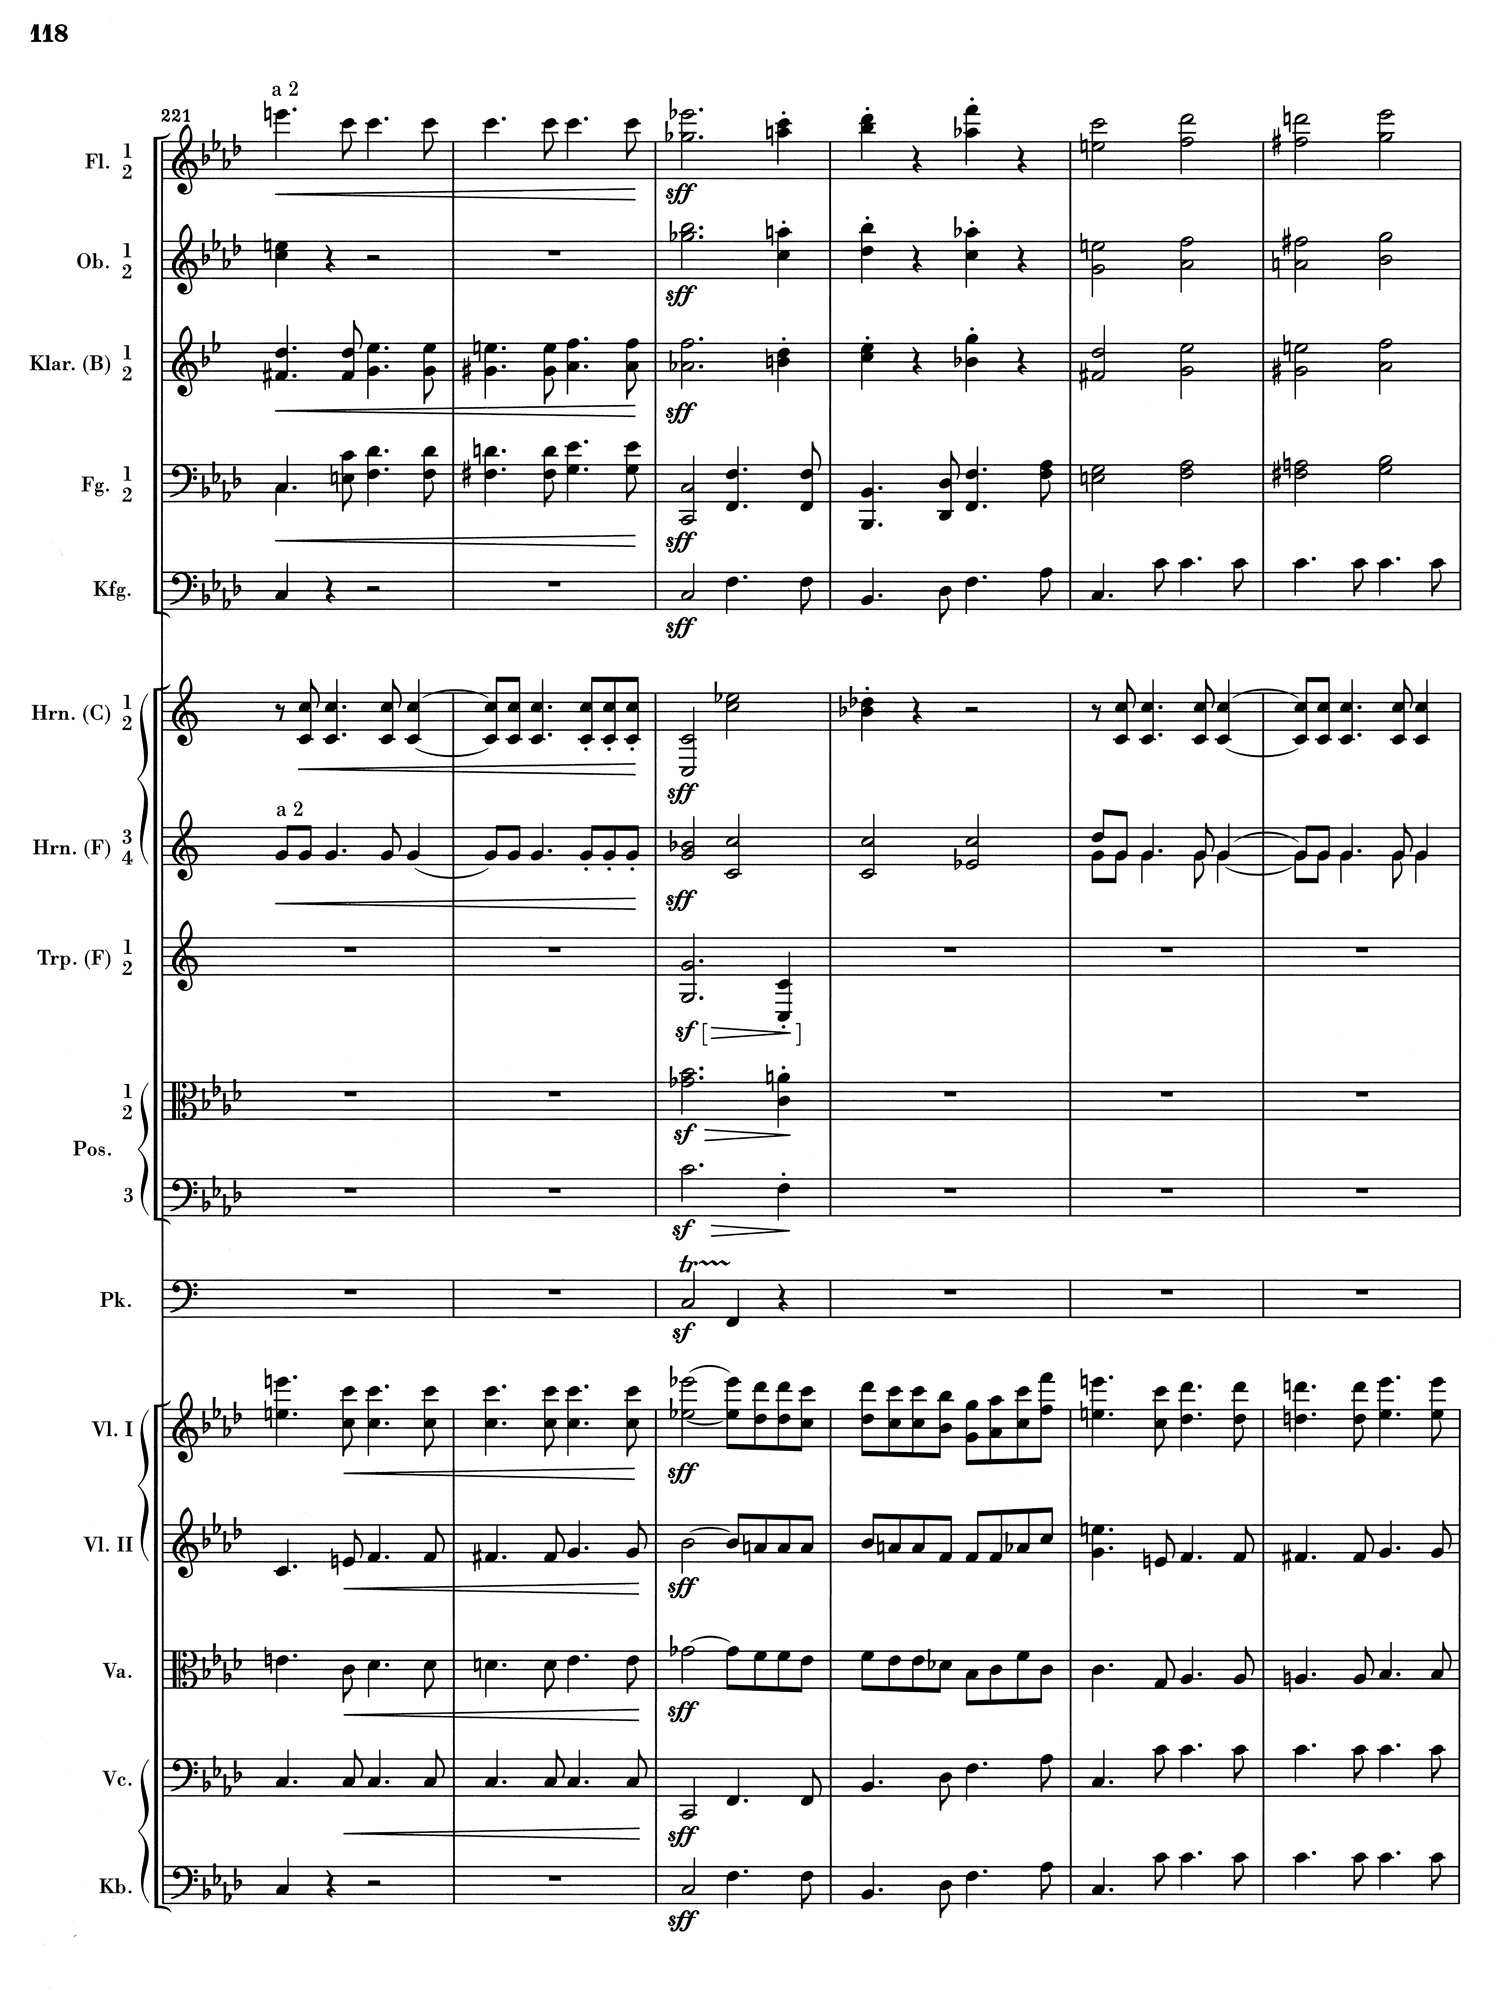 Brahms 3 Score 11.jpg